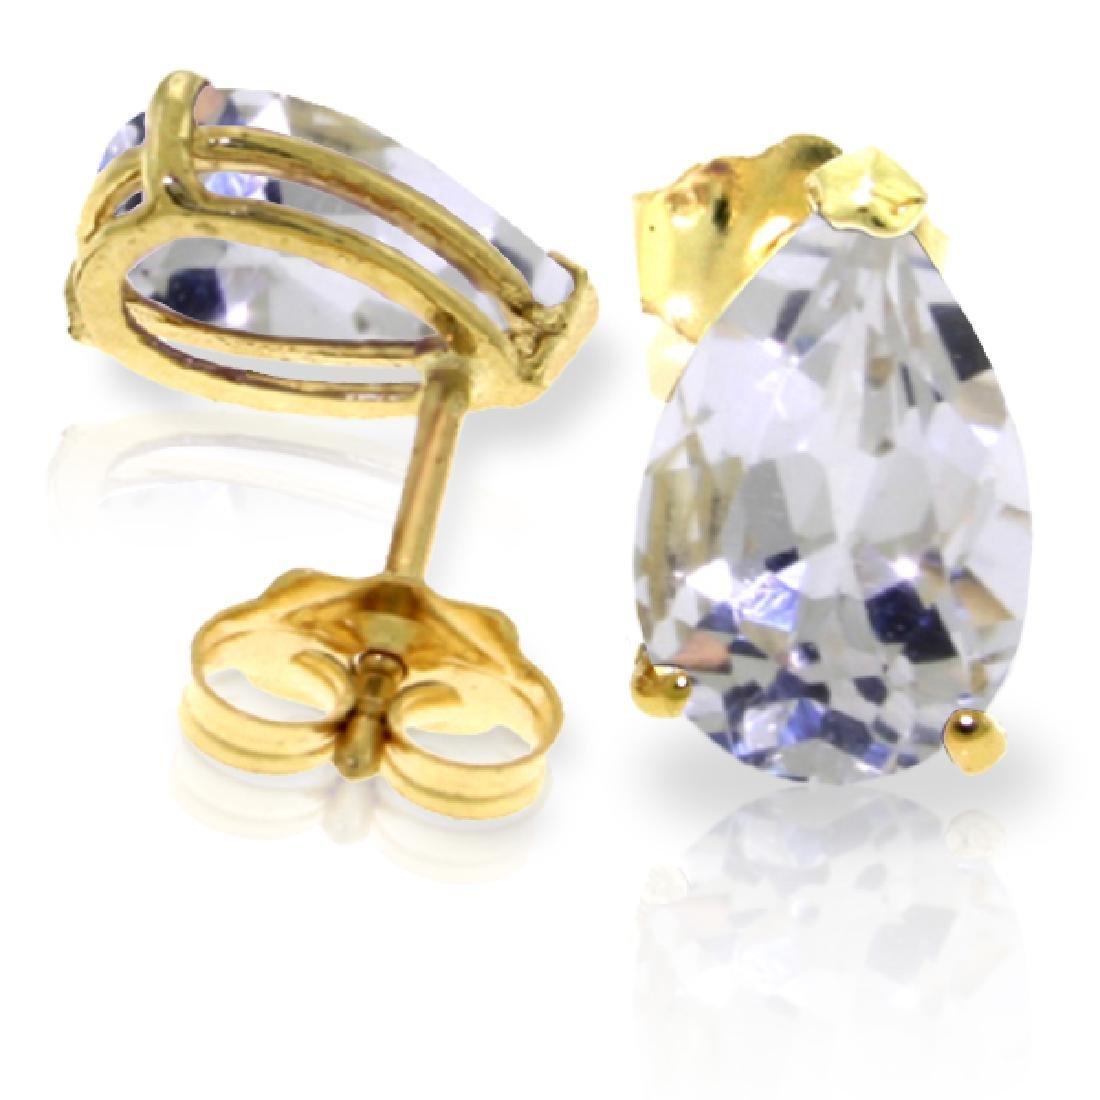 Genuine 3.15 ctw White Topaz Earrings Jewelry 14KT